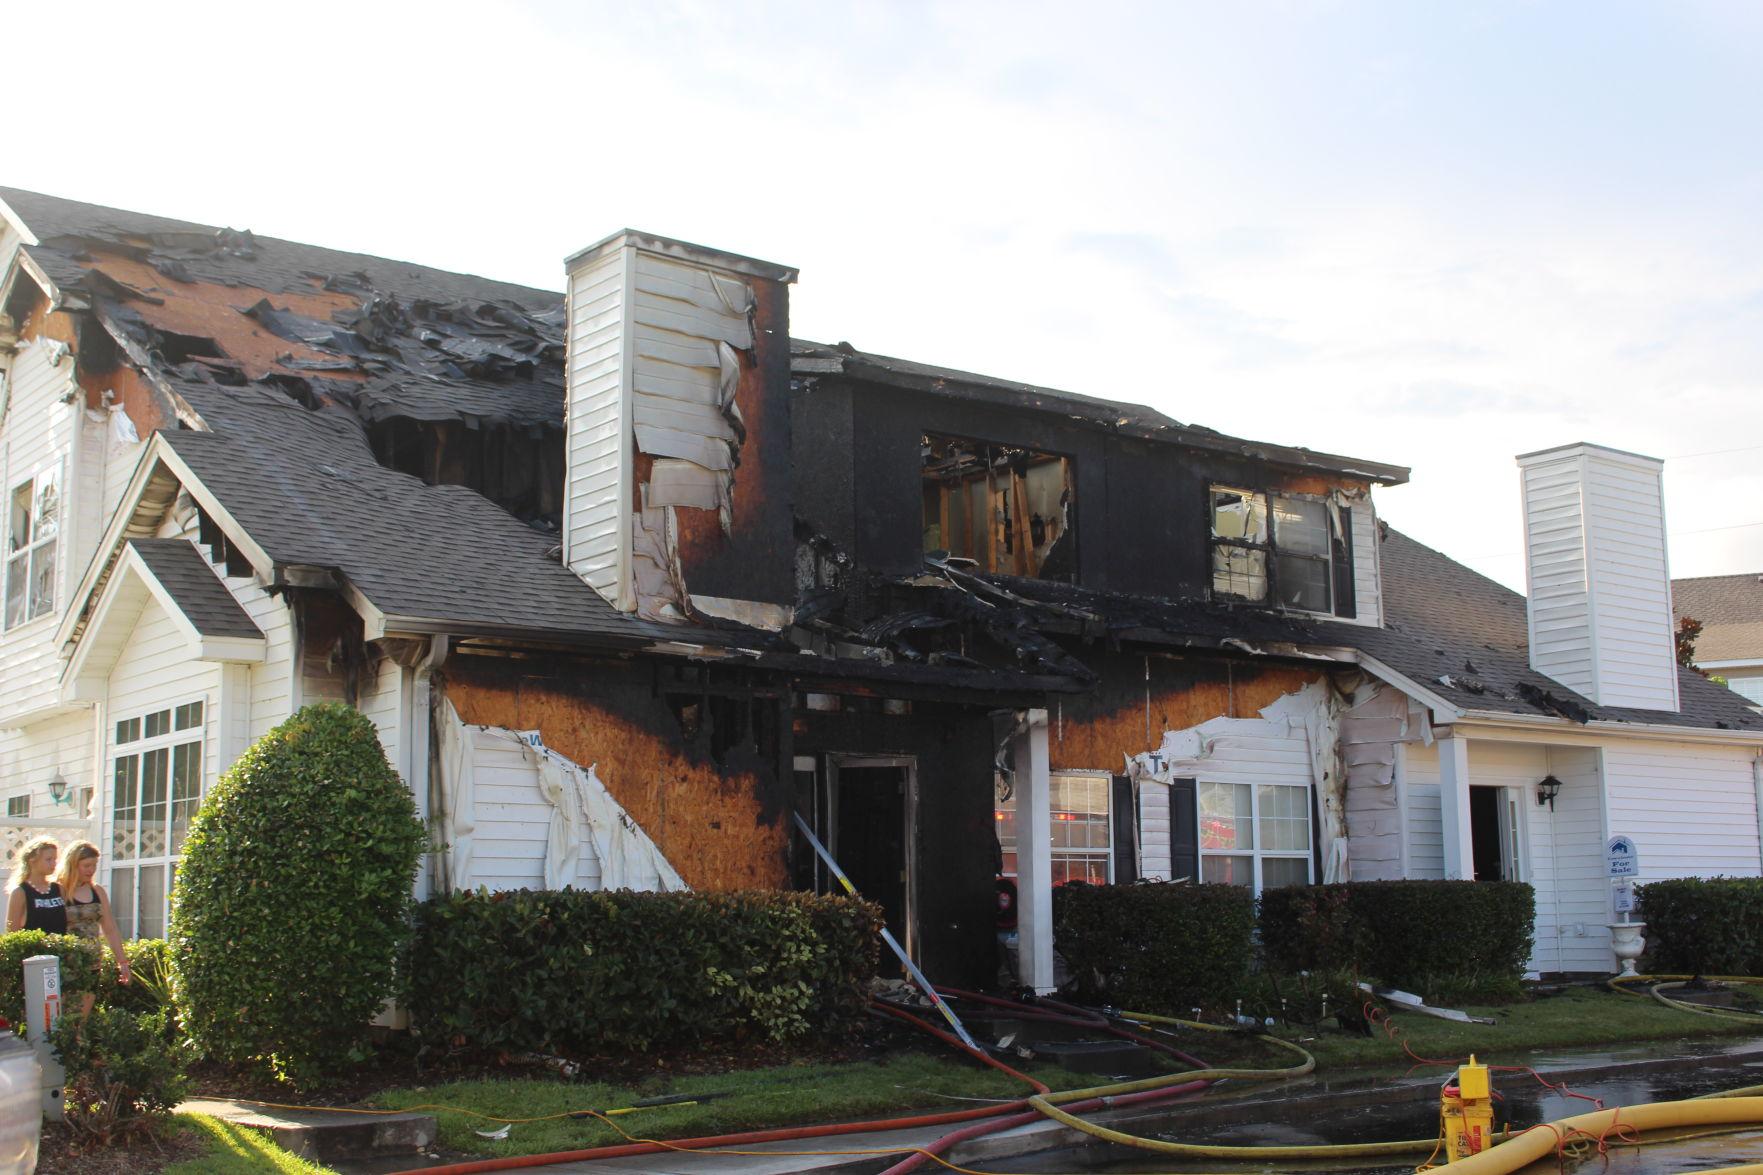 Crews battle residential fire at multi-unit building